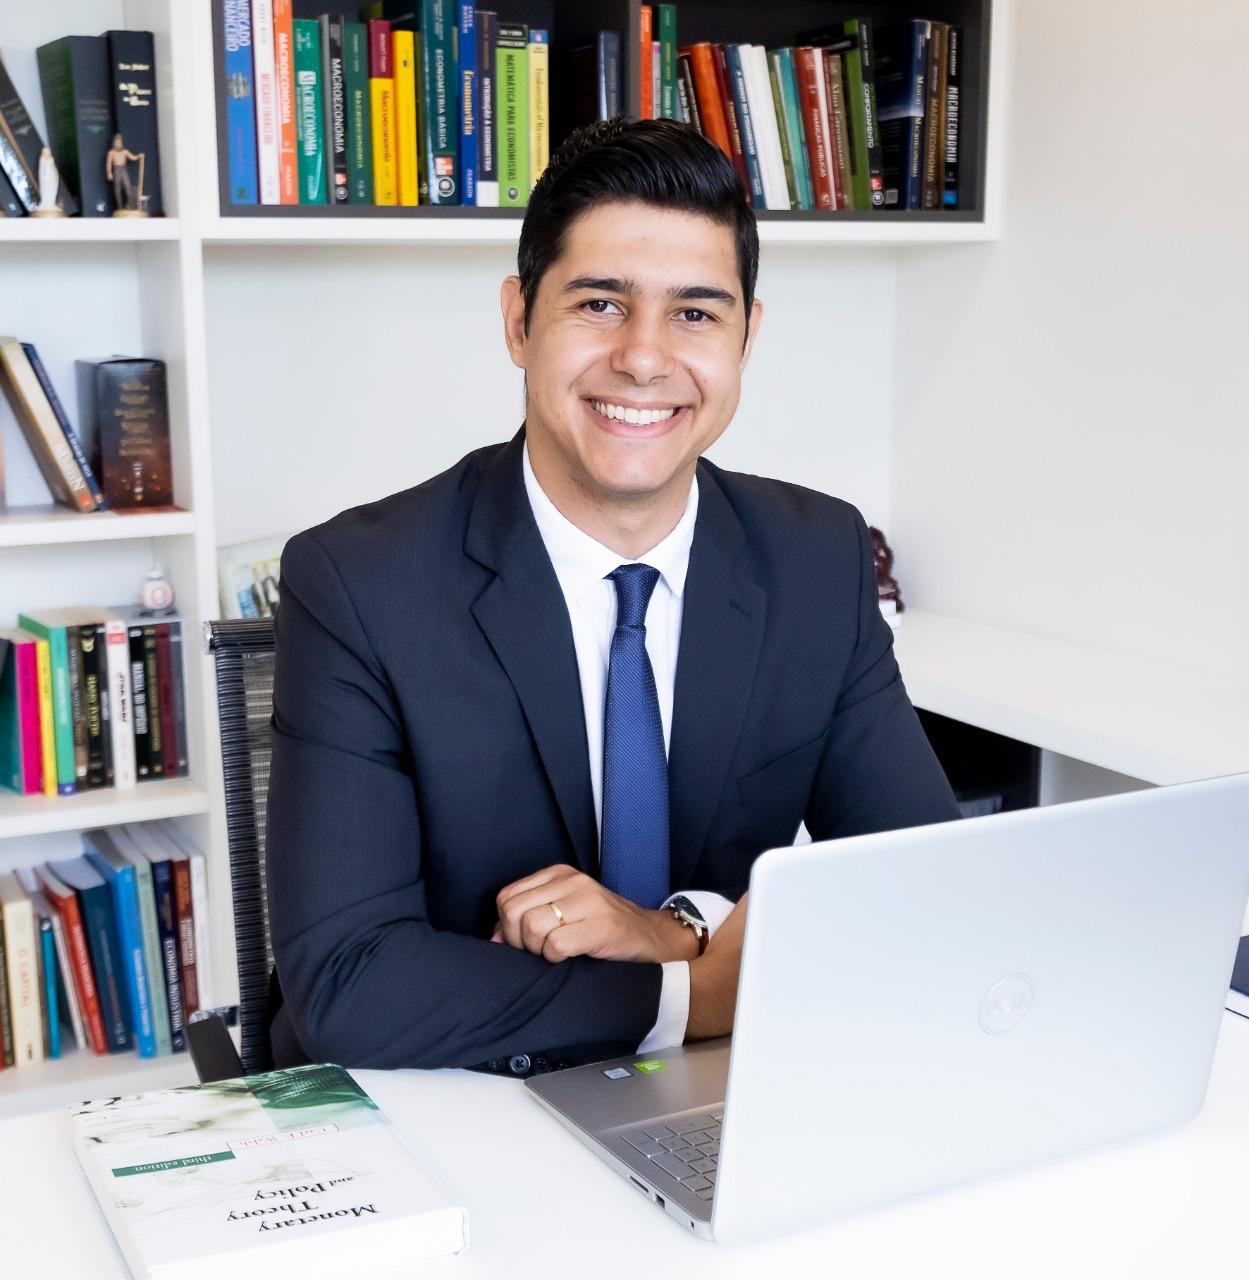 Prof. Dr. Rodolfo Tomás da Fonseca Nicolay